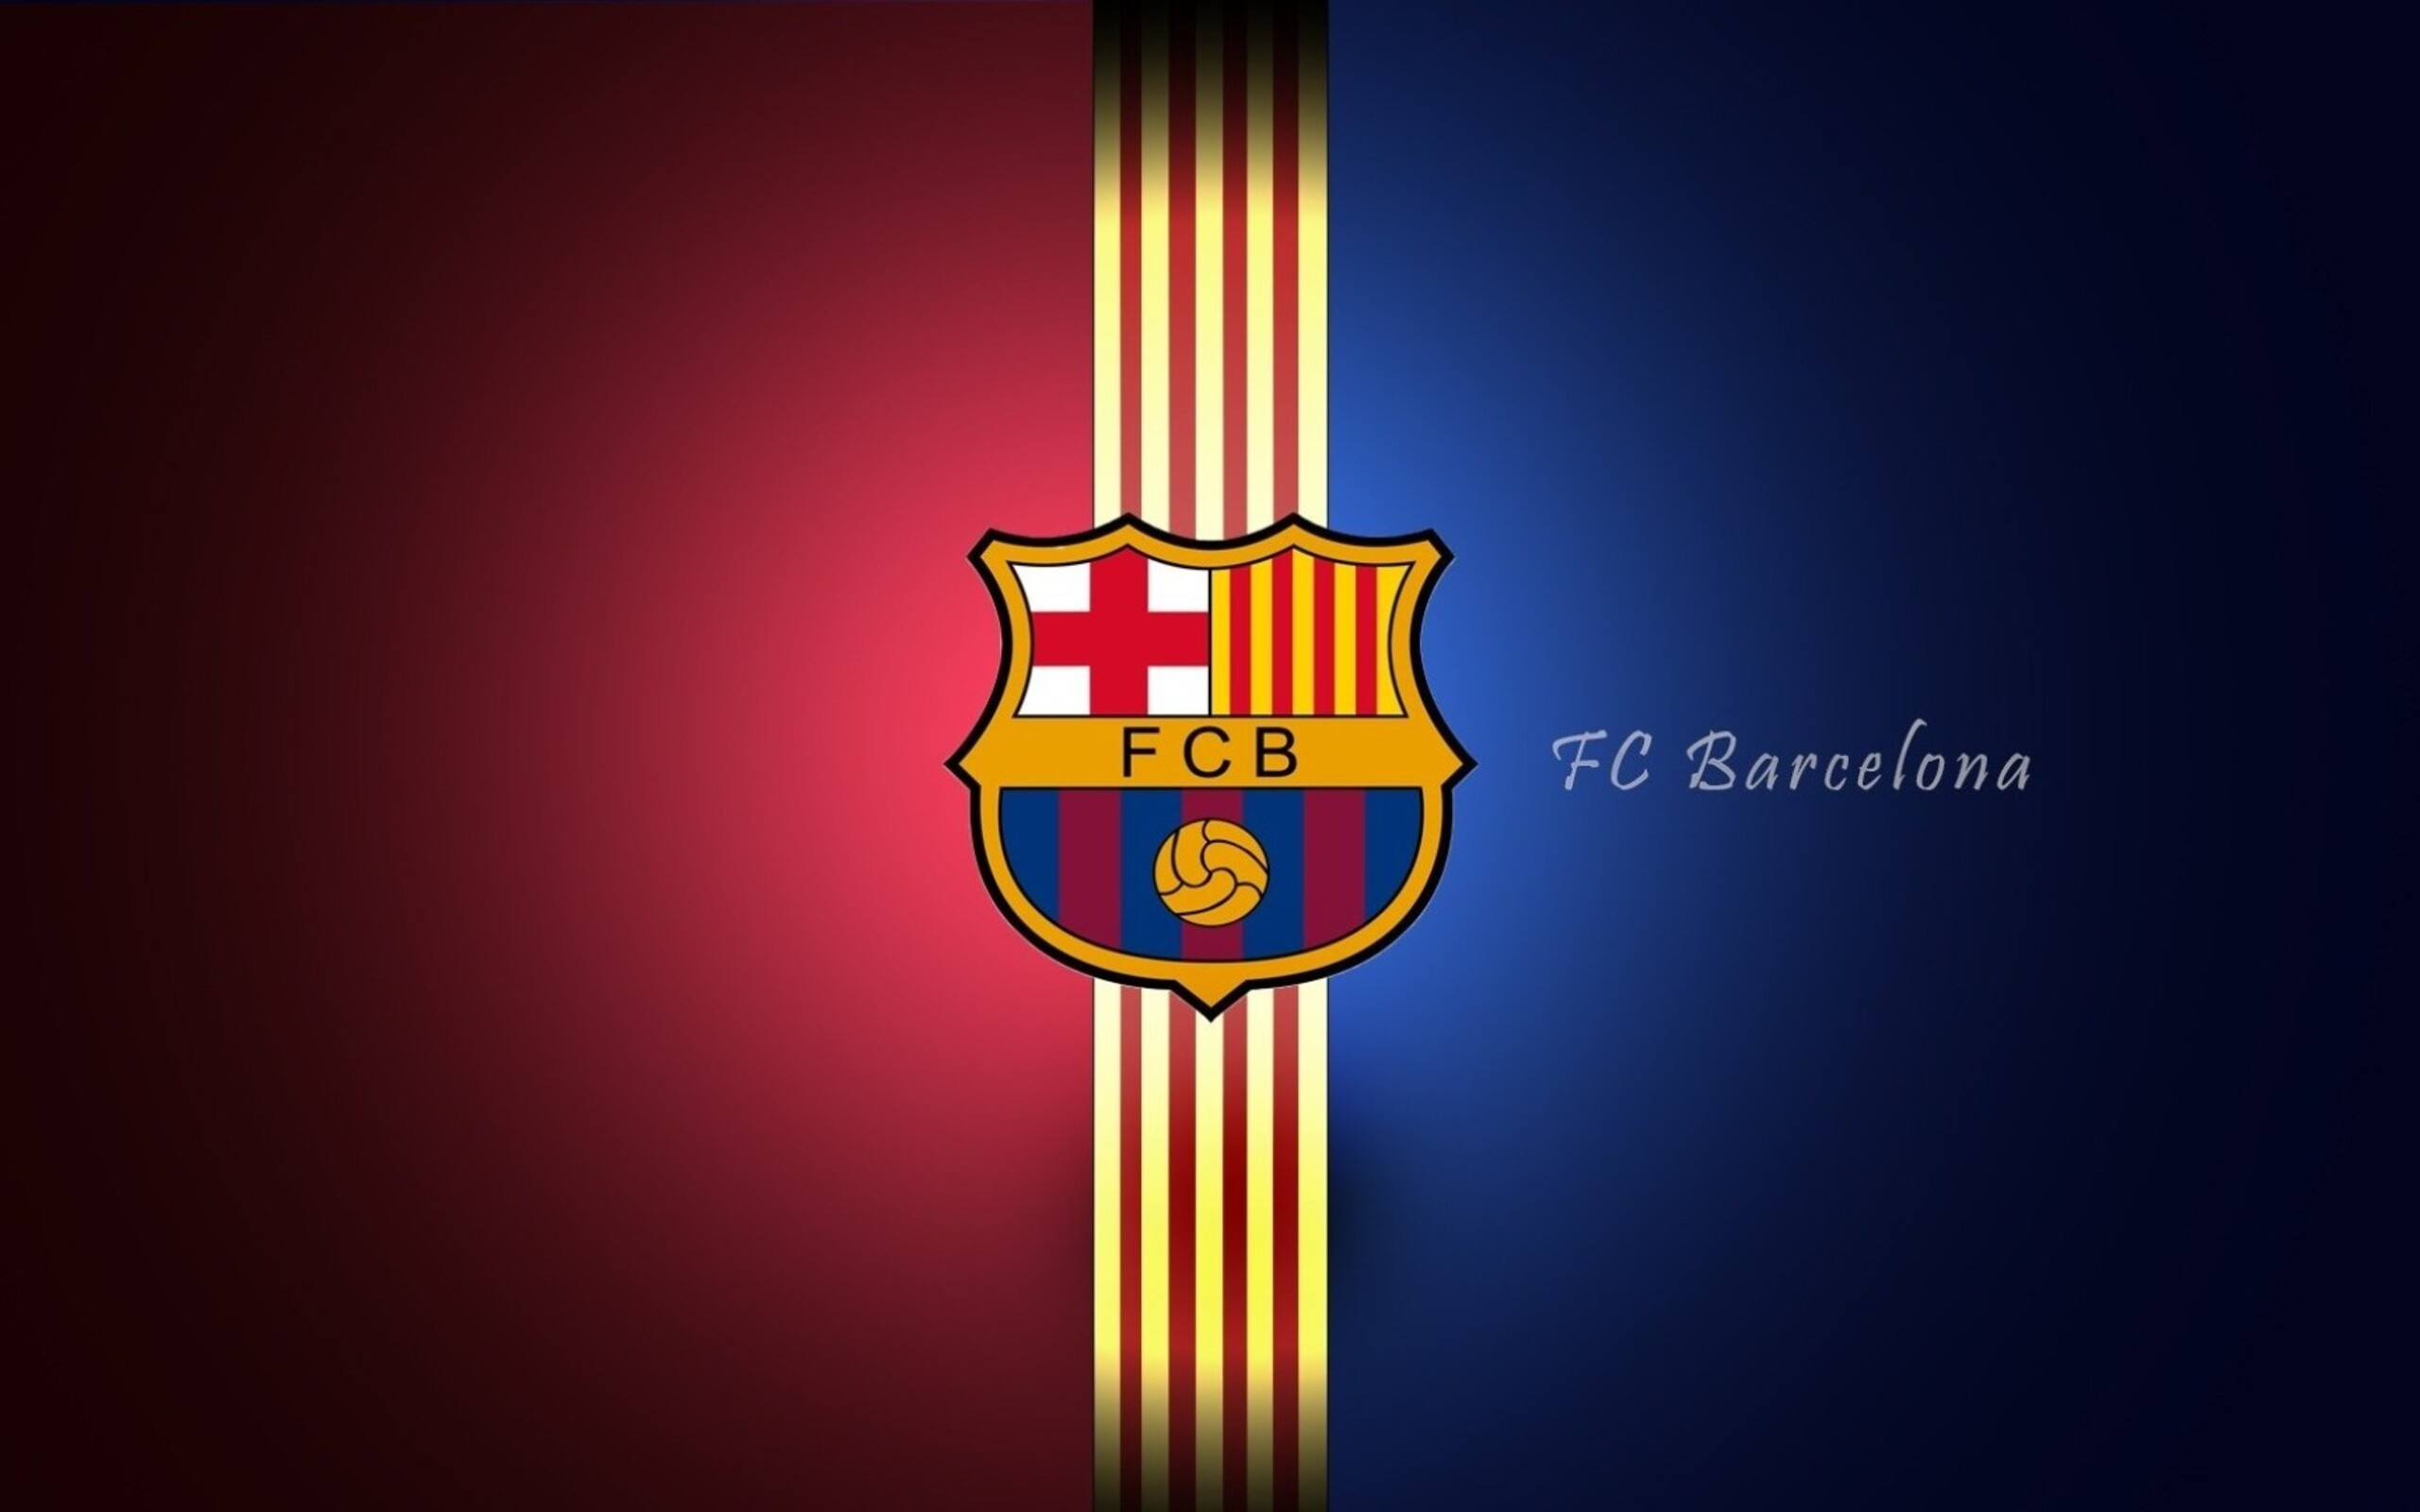 Fondos De Pantalla Del Fútbol Club Barcelona Wallpapers: 2560x1600 Fc Barcelona 2560x1600 Resolution HD 4k